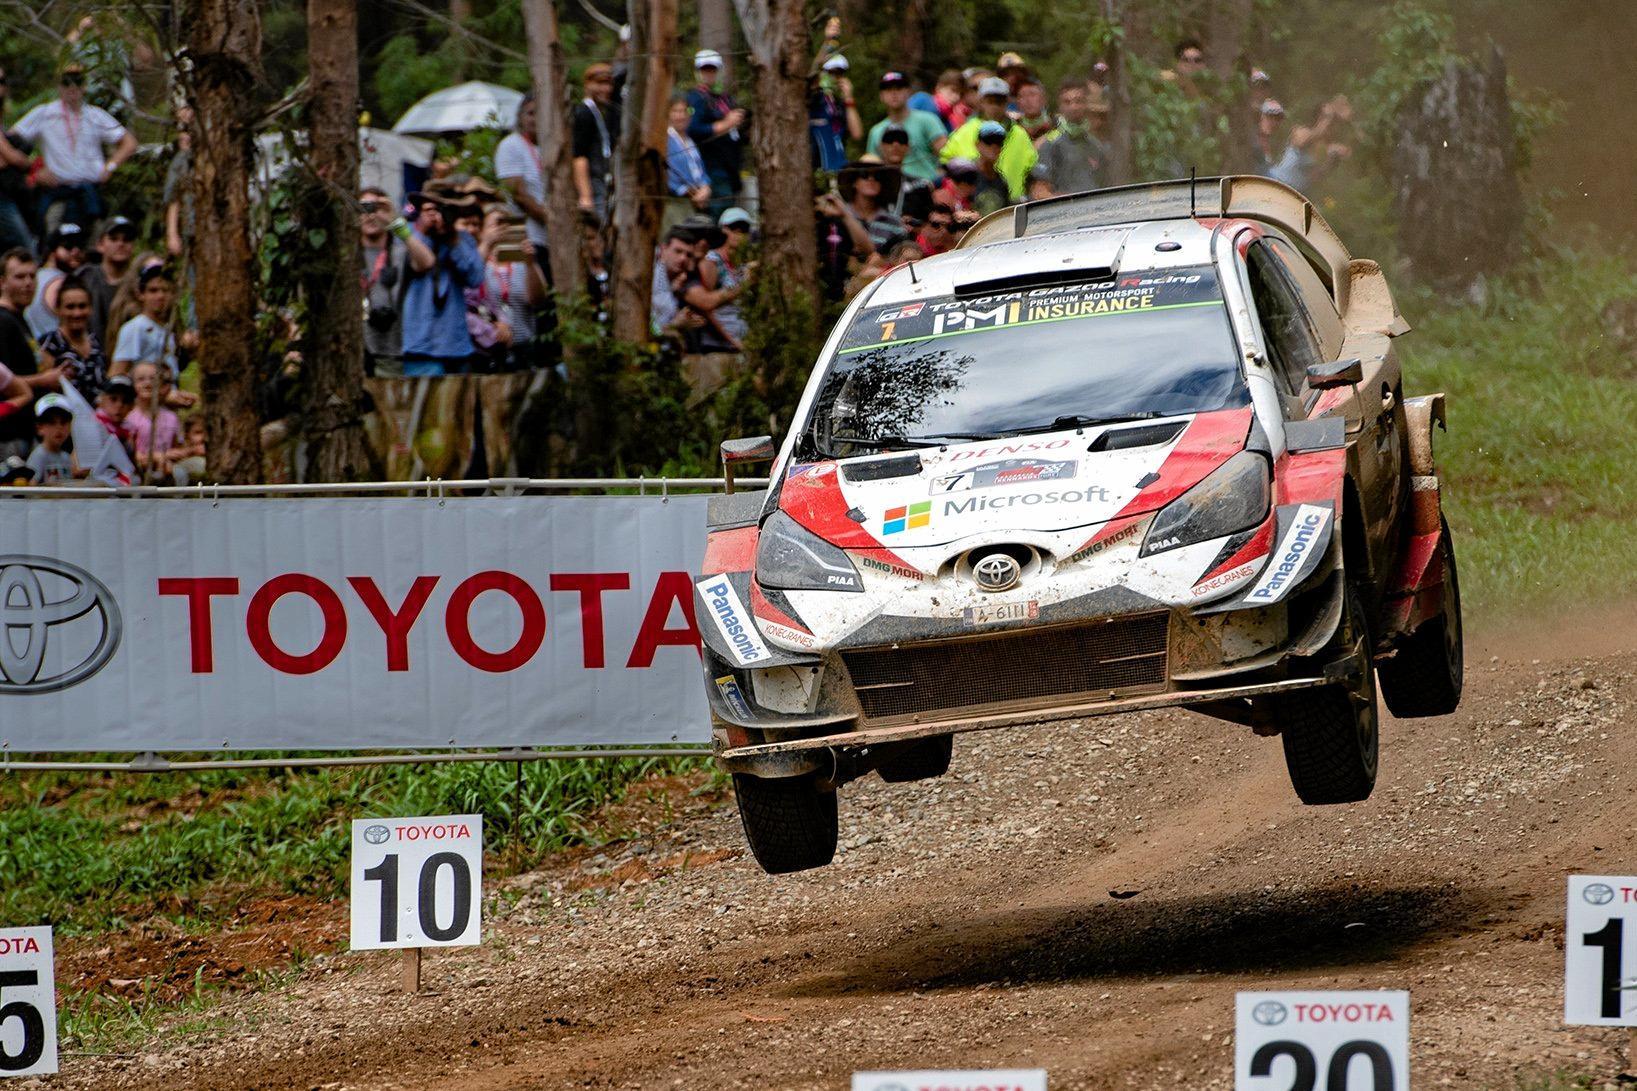 2018 WRC Kennards Hire Rally Australia final day Sherwood Forest stage at NSW Rally Park. Winner of the 2018 Rally in Coffs ws Jari-Matti Latvala . 18 NOV 2018. 18 NOV 2018